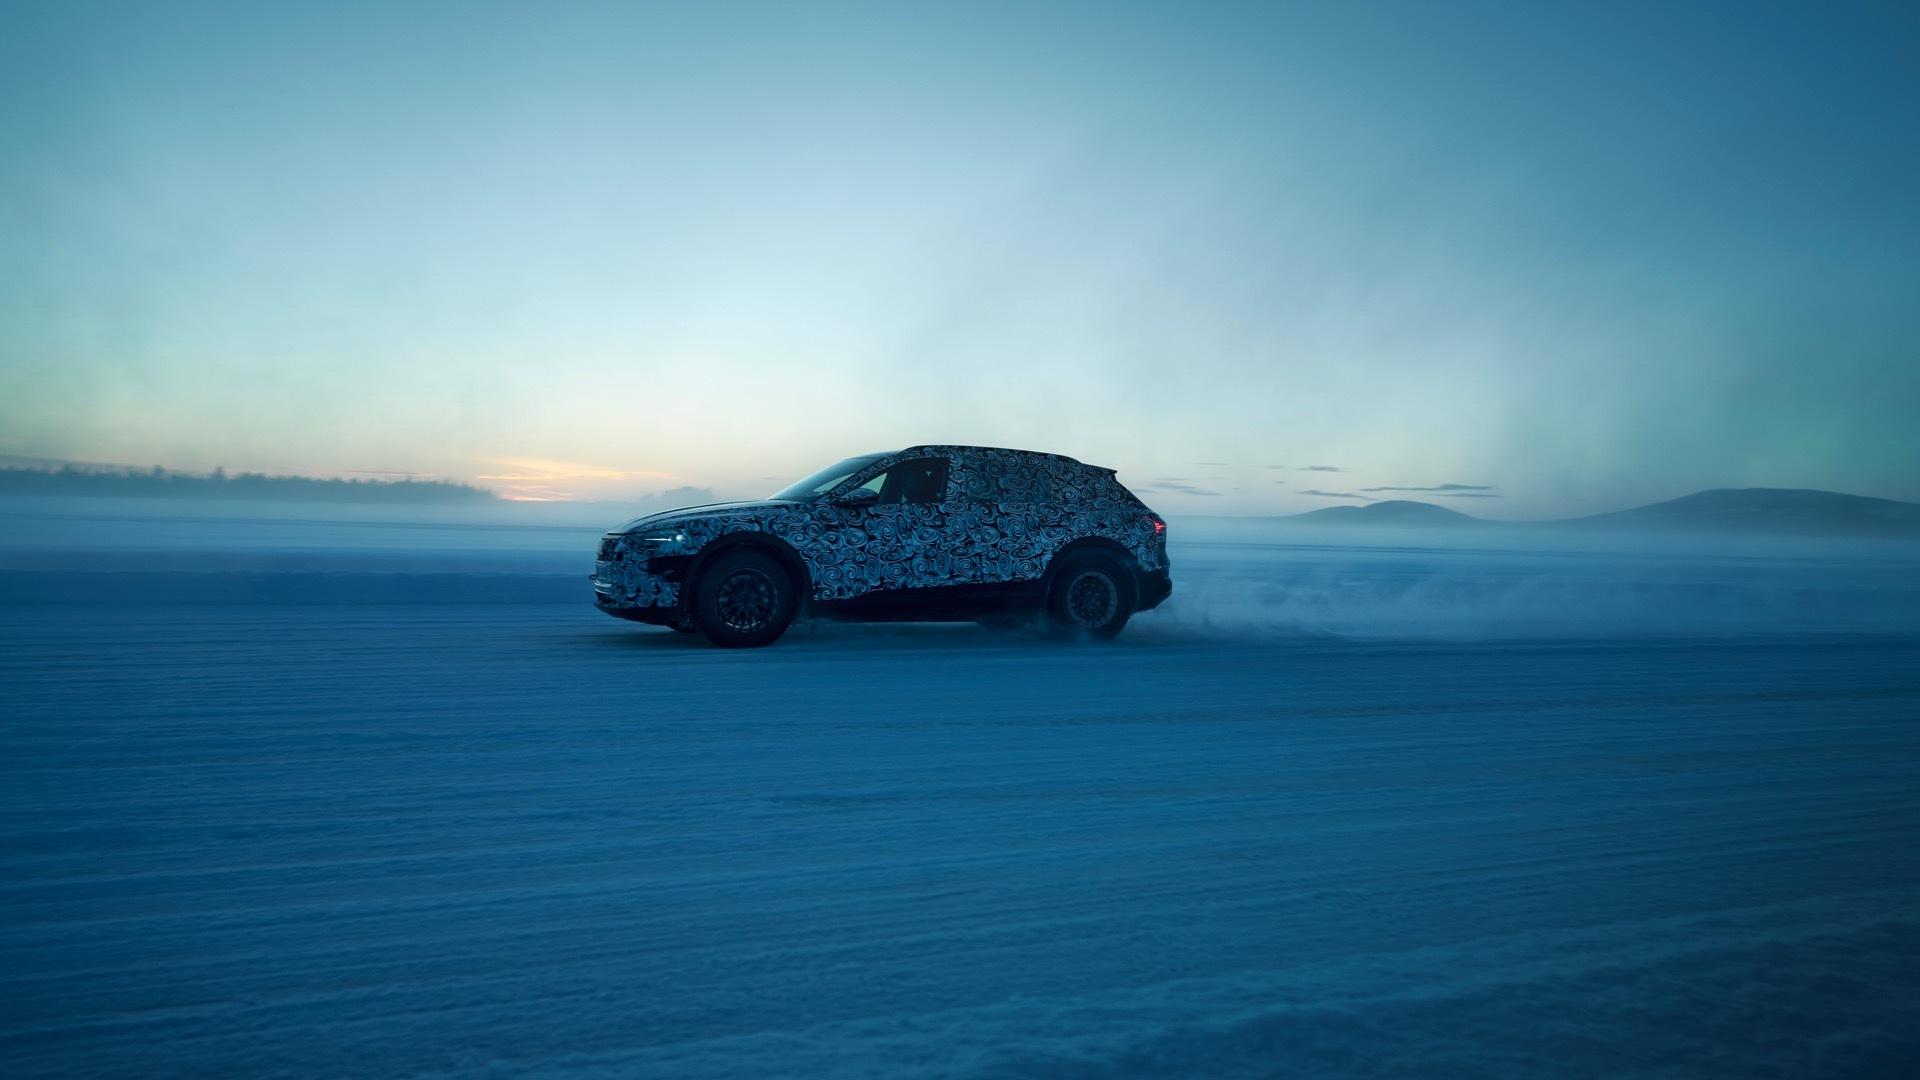 Polarlights – Audi e-tron Prototyp